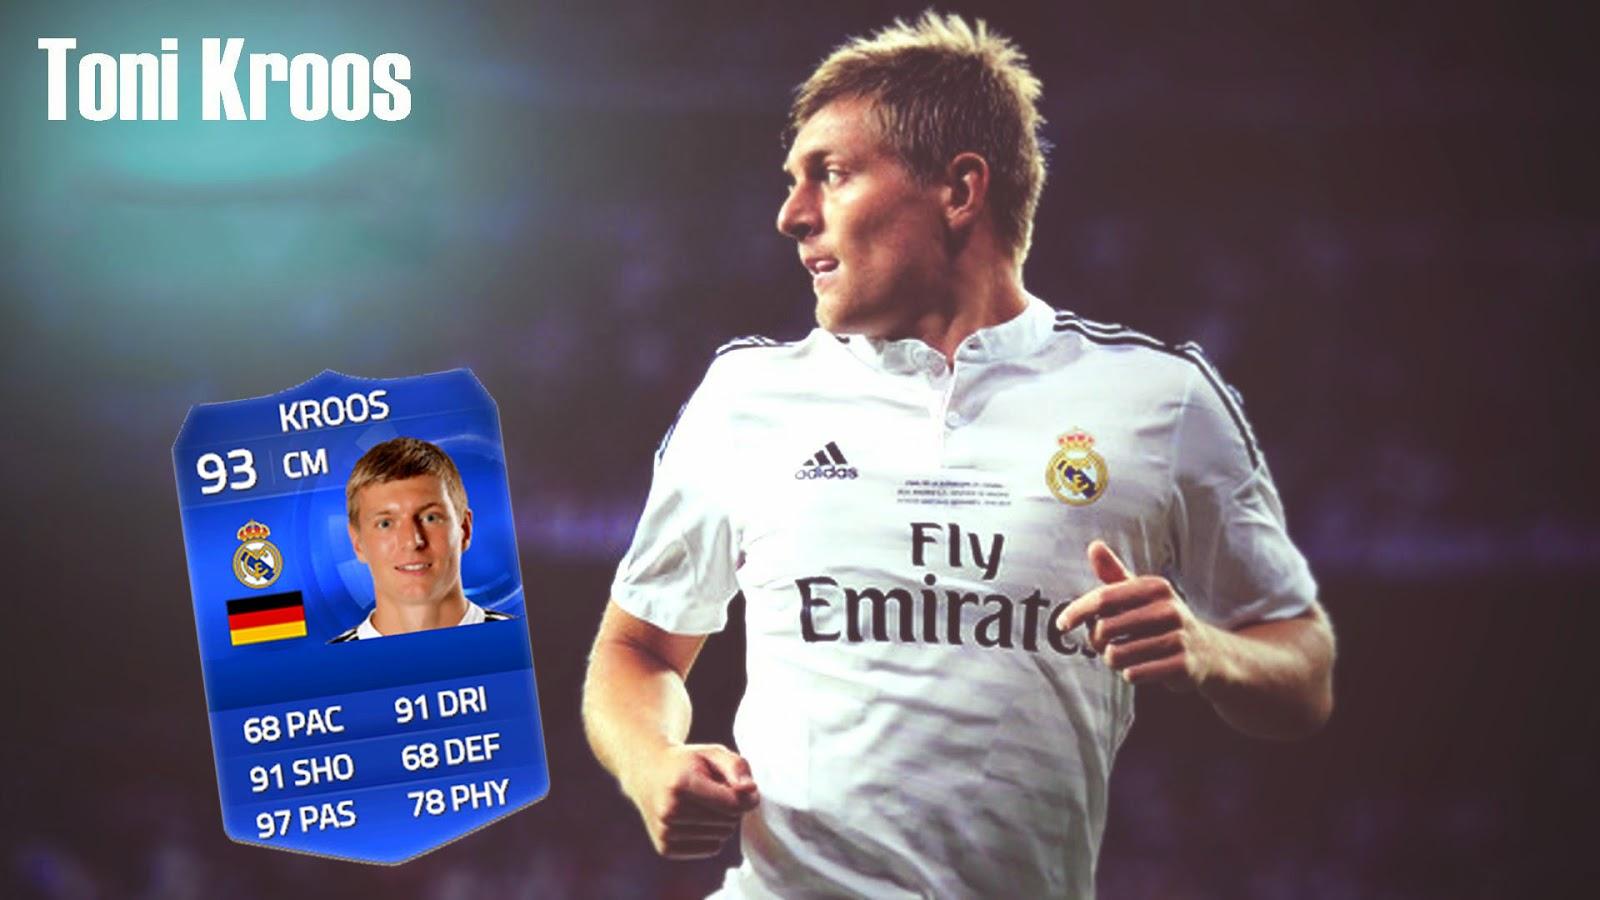 Review Kroos TOTY FIFA 15 Ultimate Team